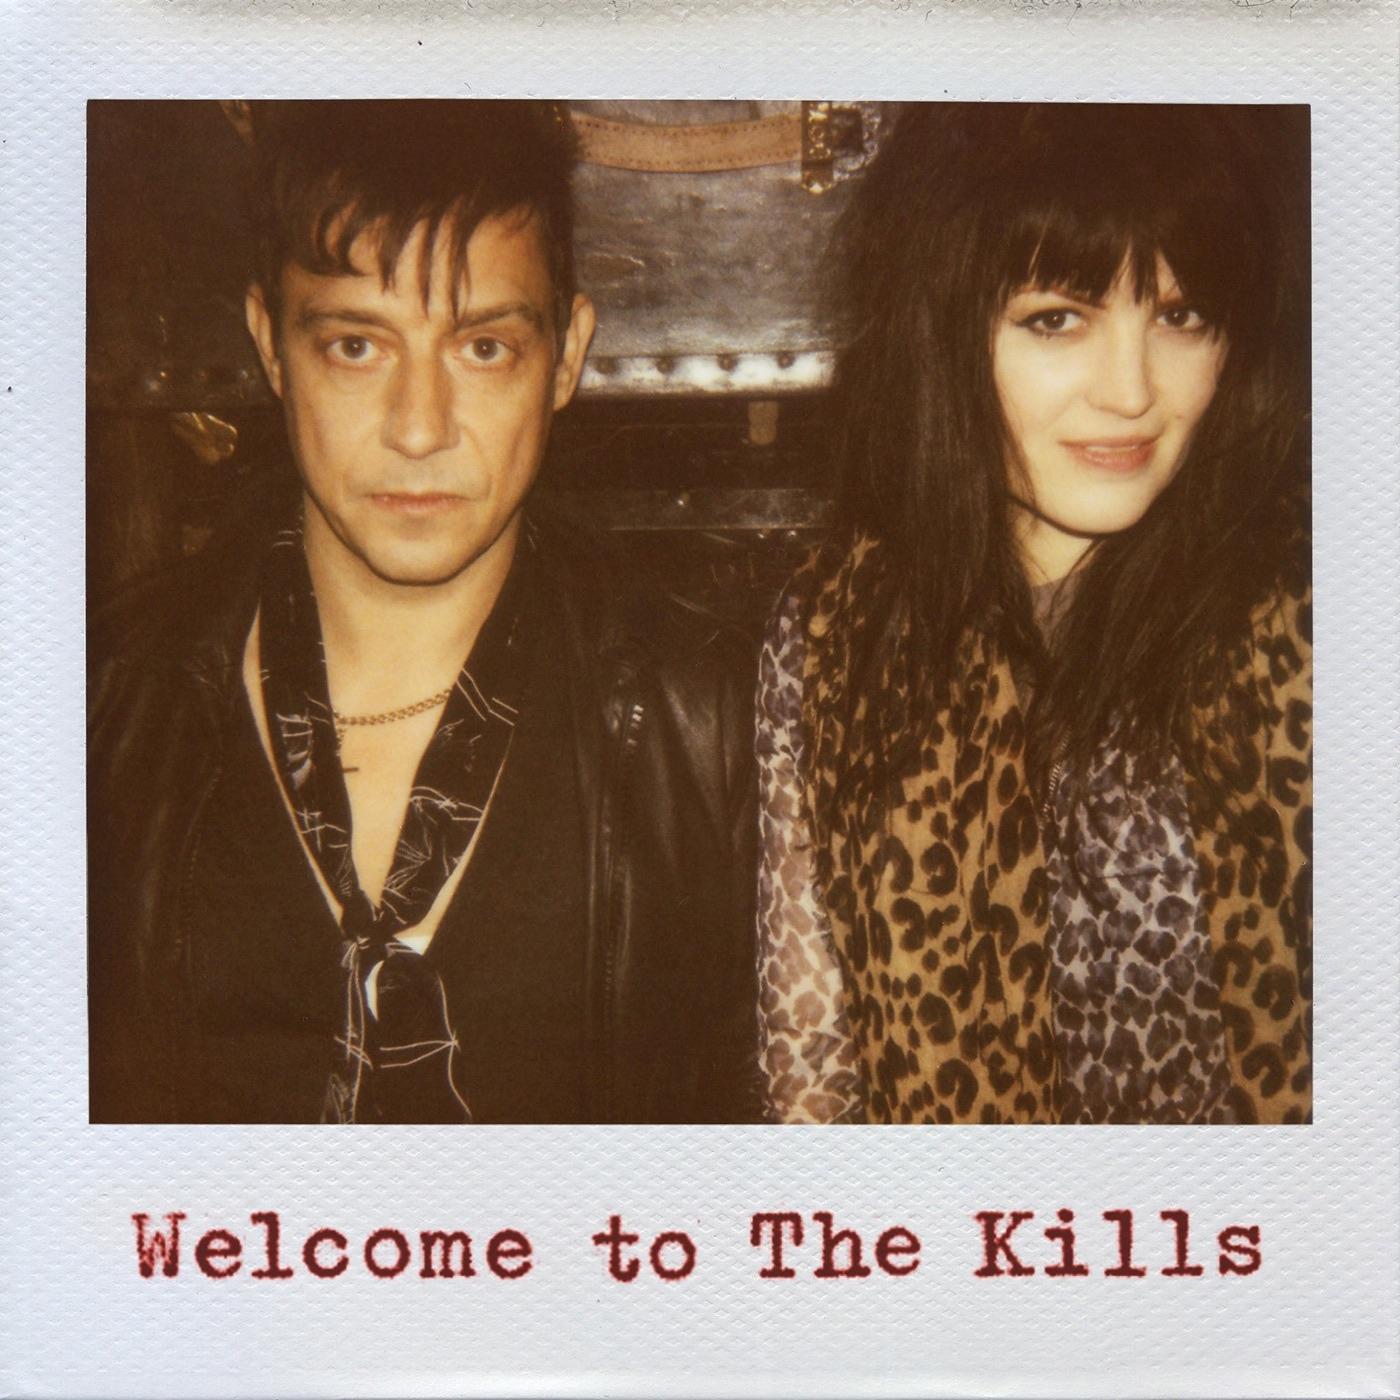 The Kills album Welcome to The Kills